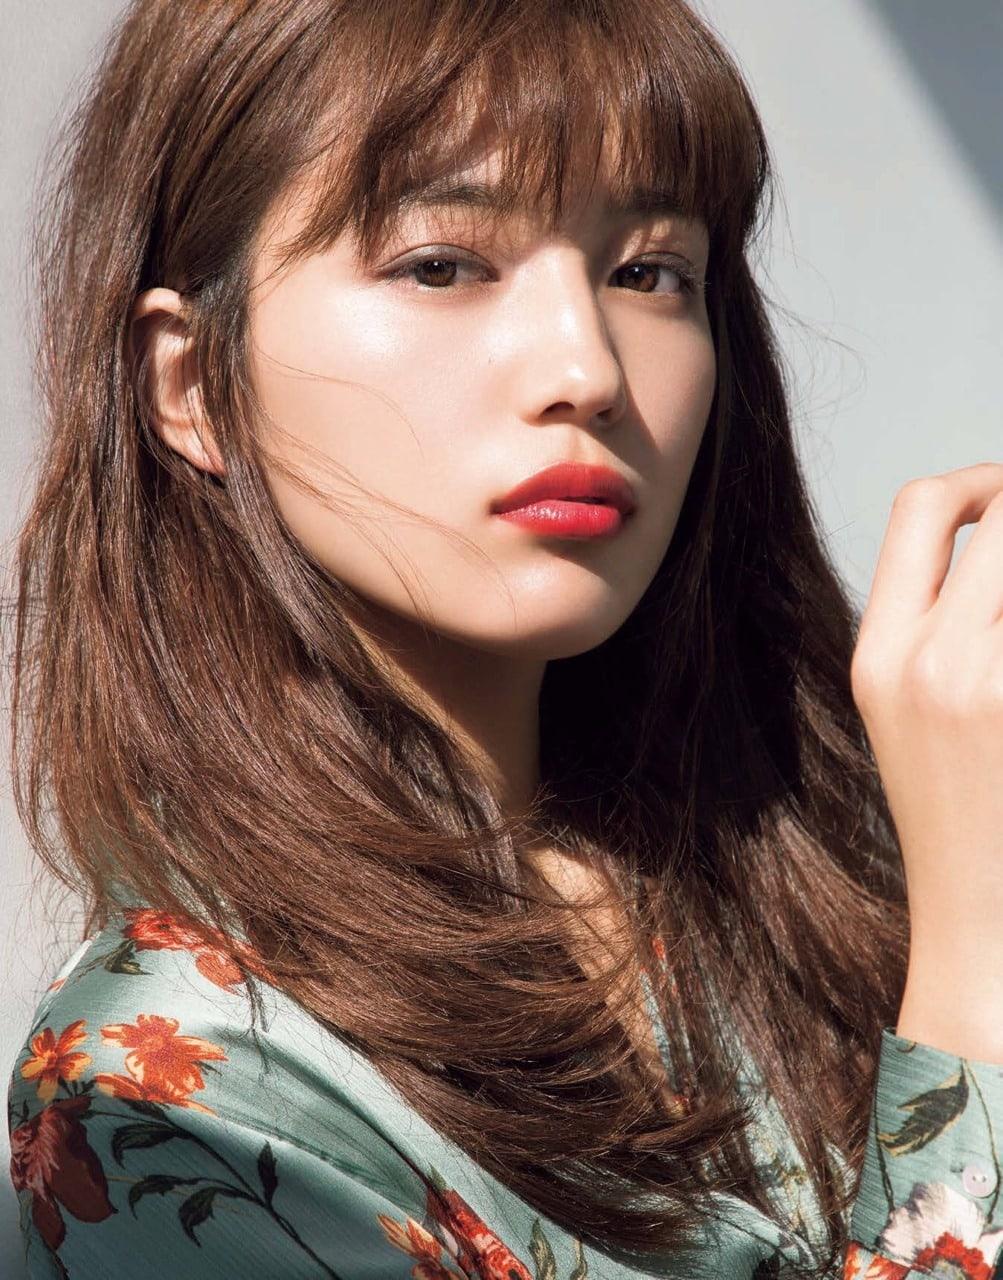 haruna kawaguchi trang điểm đẹp